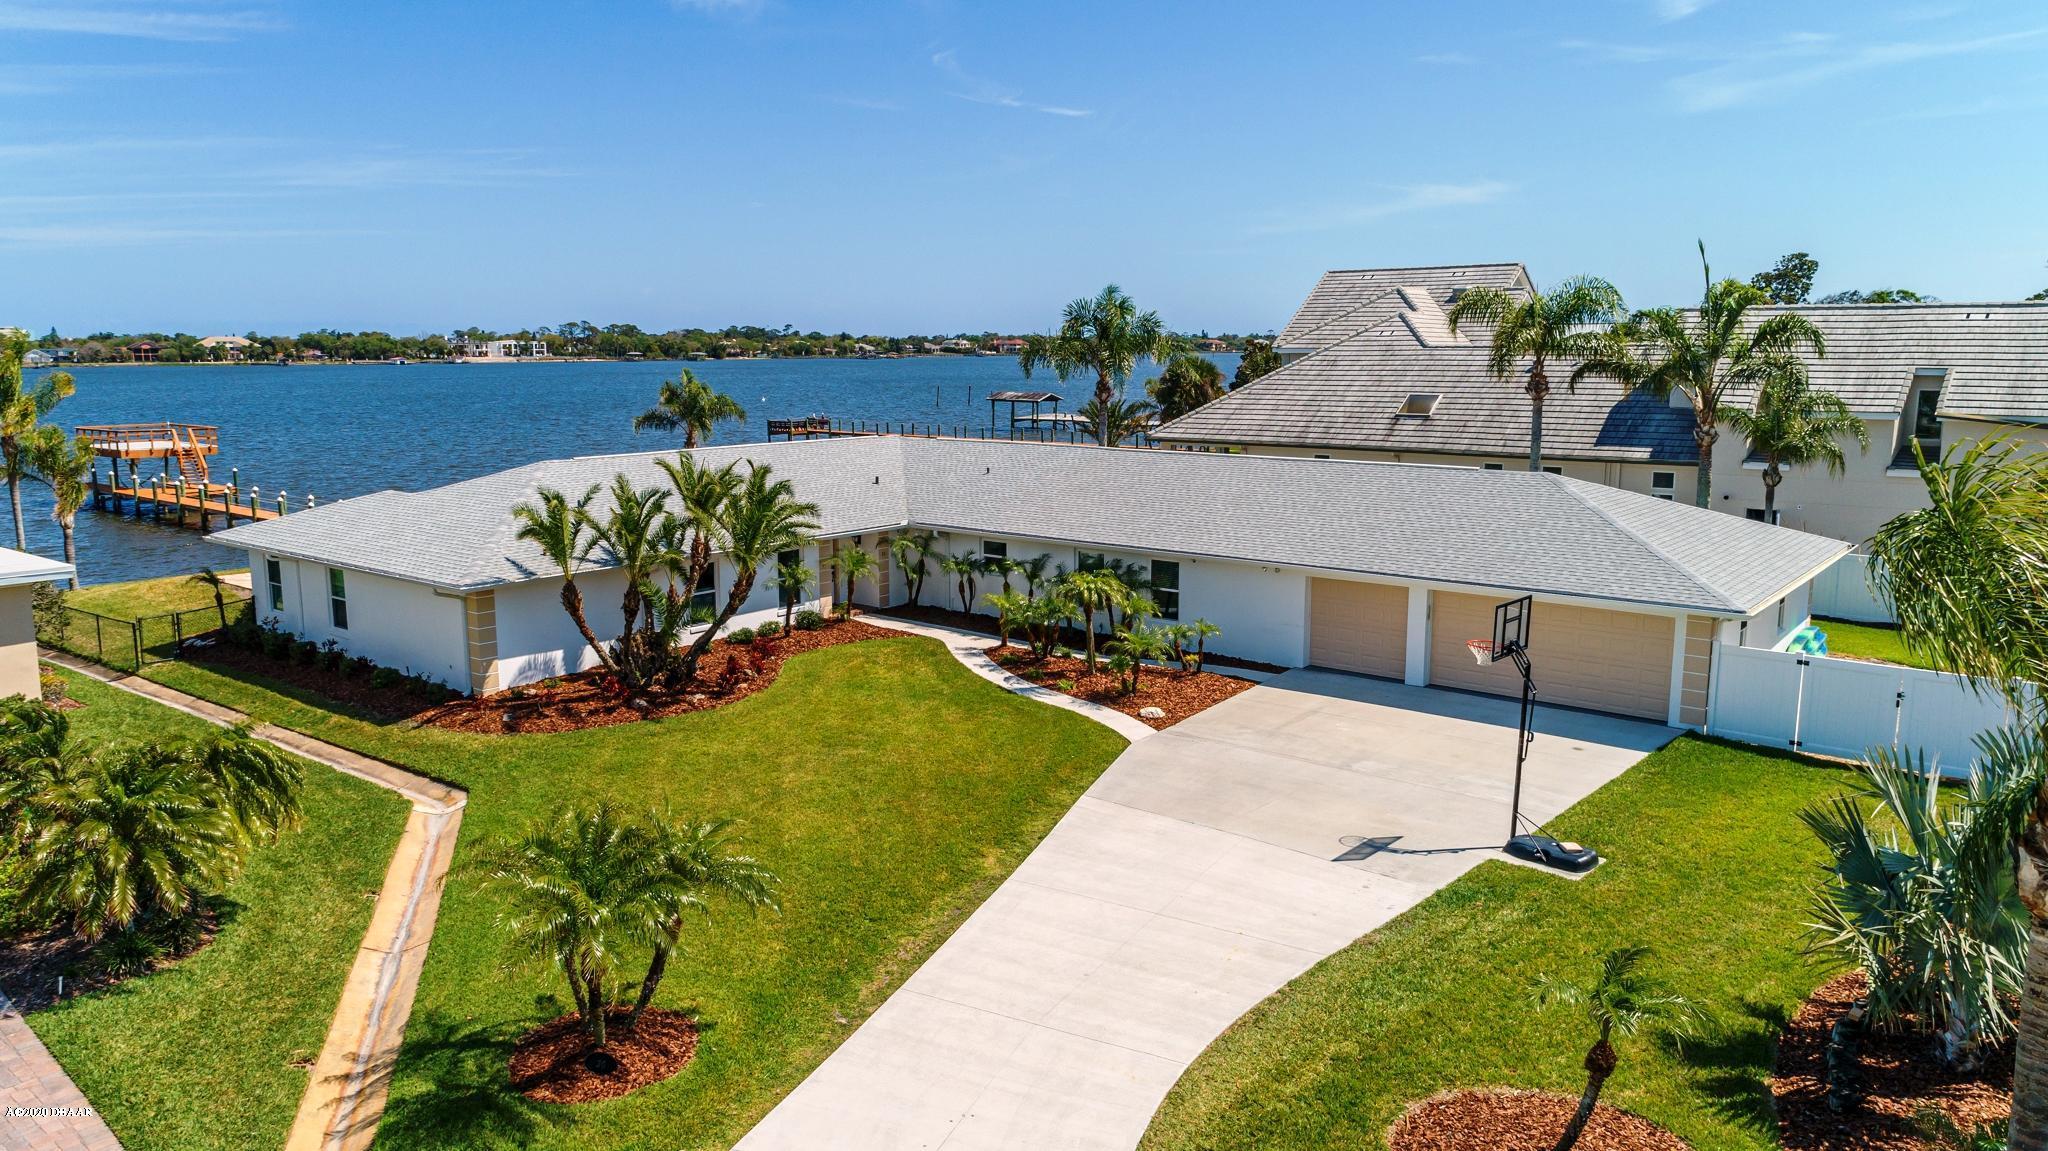 Photo of 30 Sterling Circle, Ormond Beach, FL 32174